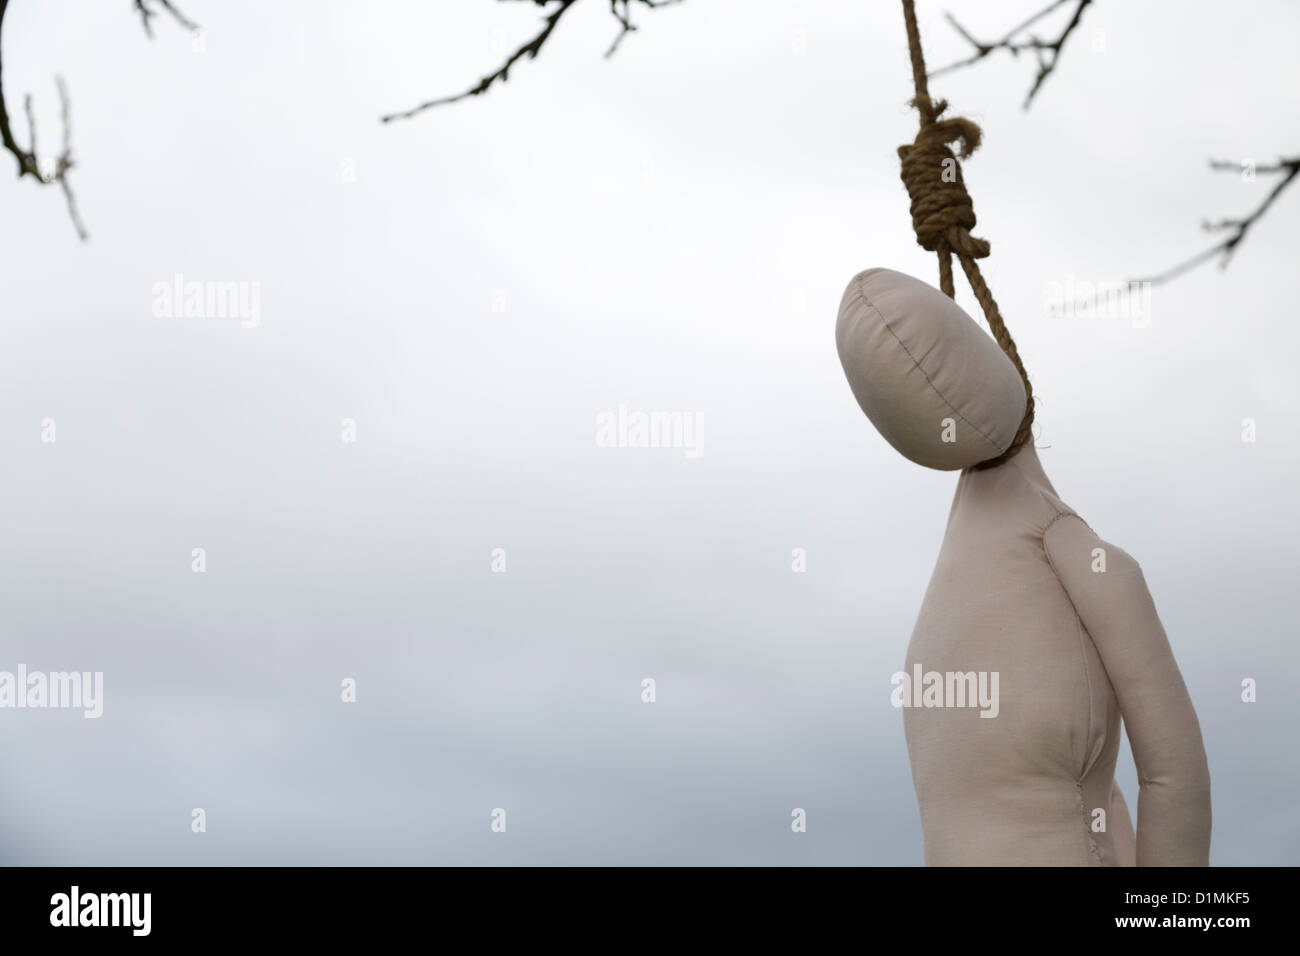 Hangman's Noose with Rag Doll - Stock Image